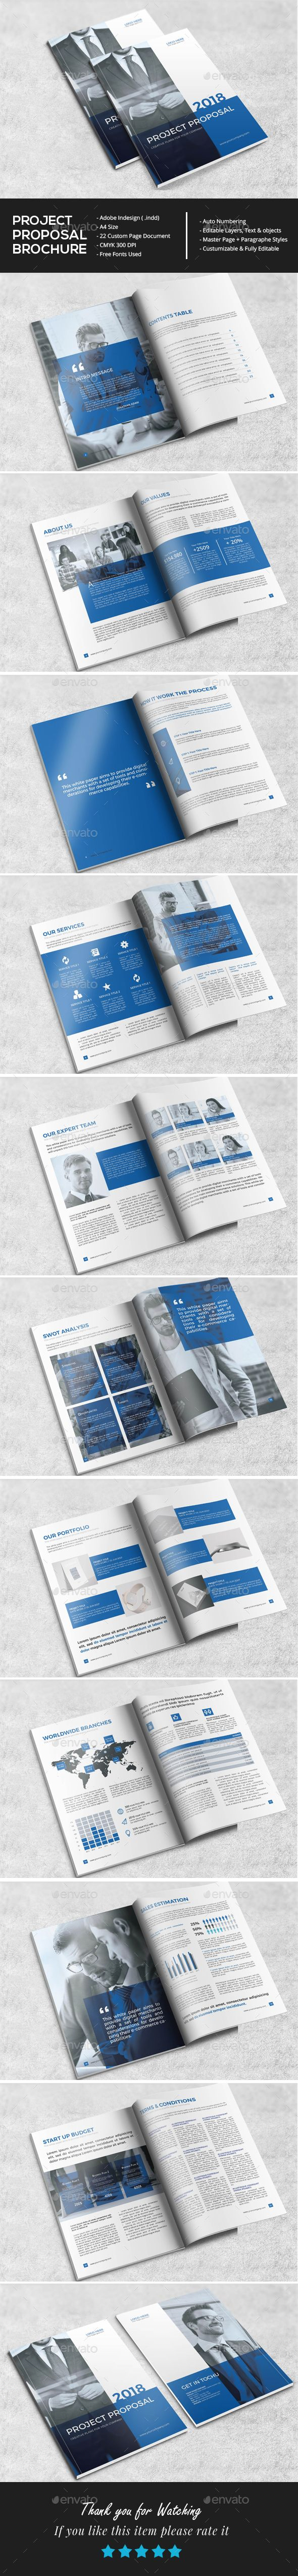 Professional Project Proposal Brochures Print Templates